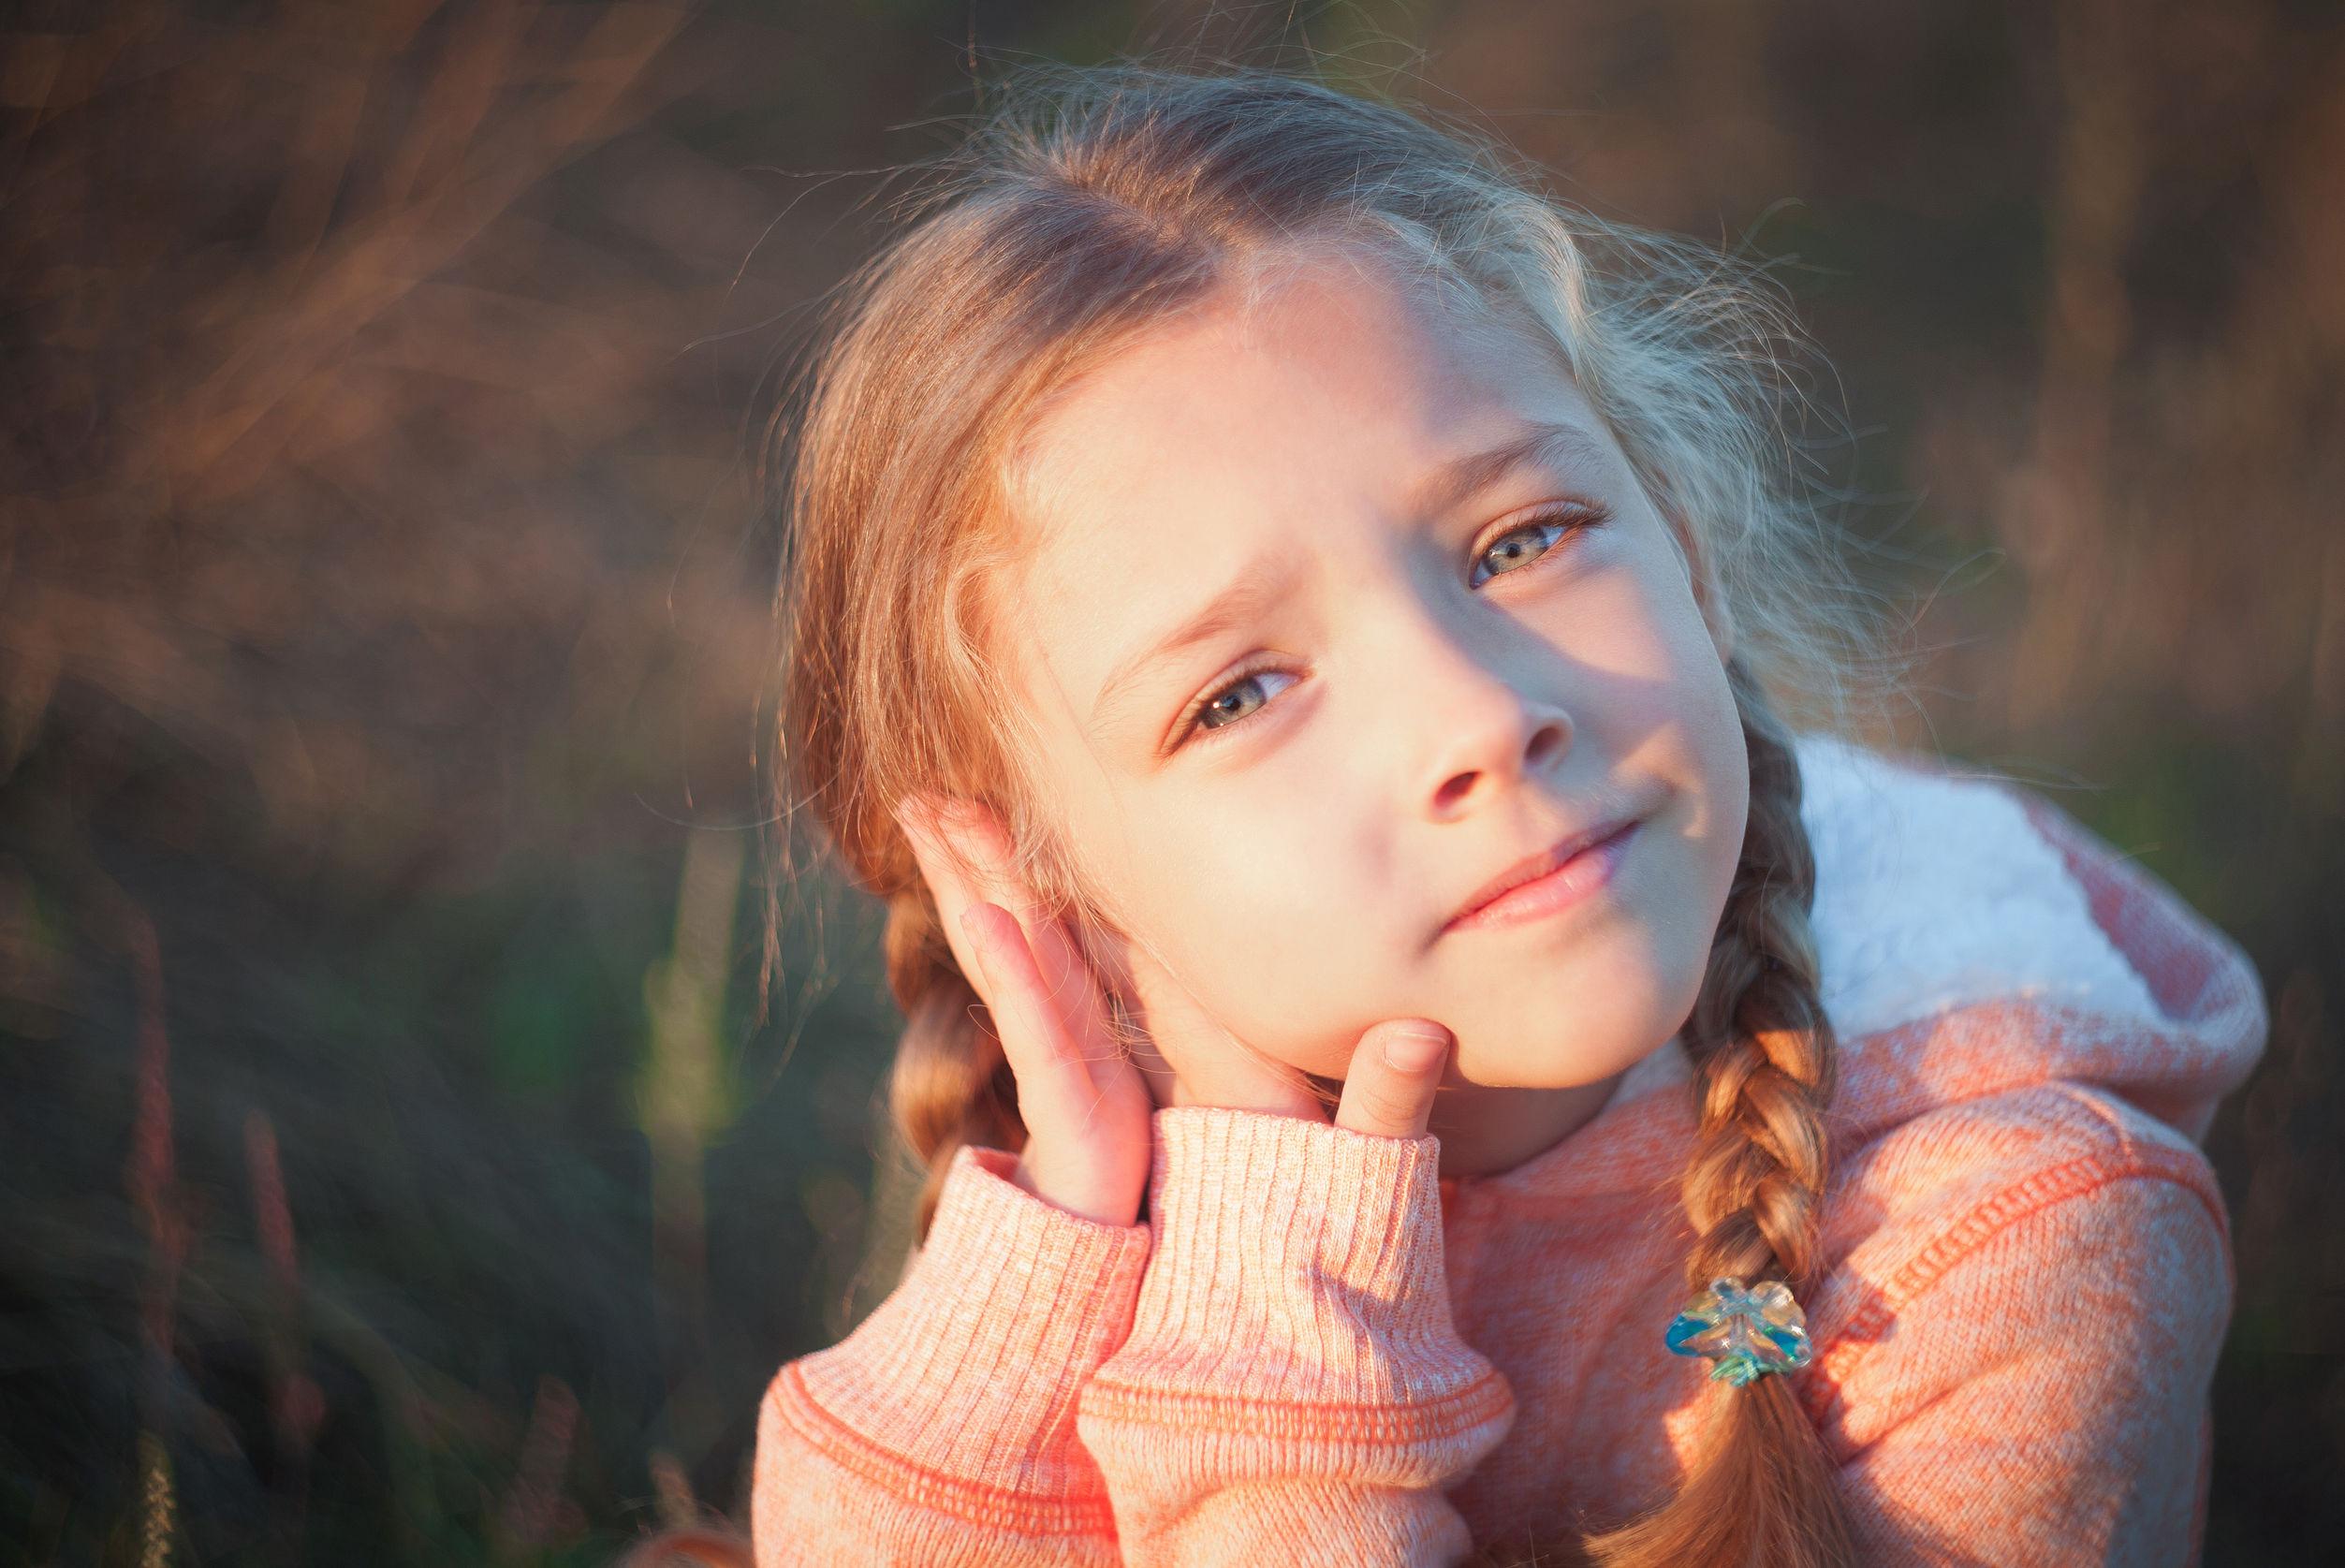 Psoriasis-Kinder-Studie-CAIN457A2310_Novartis_Foto